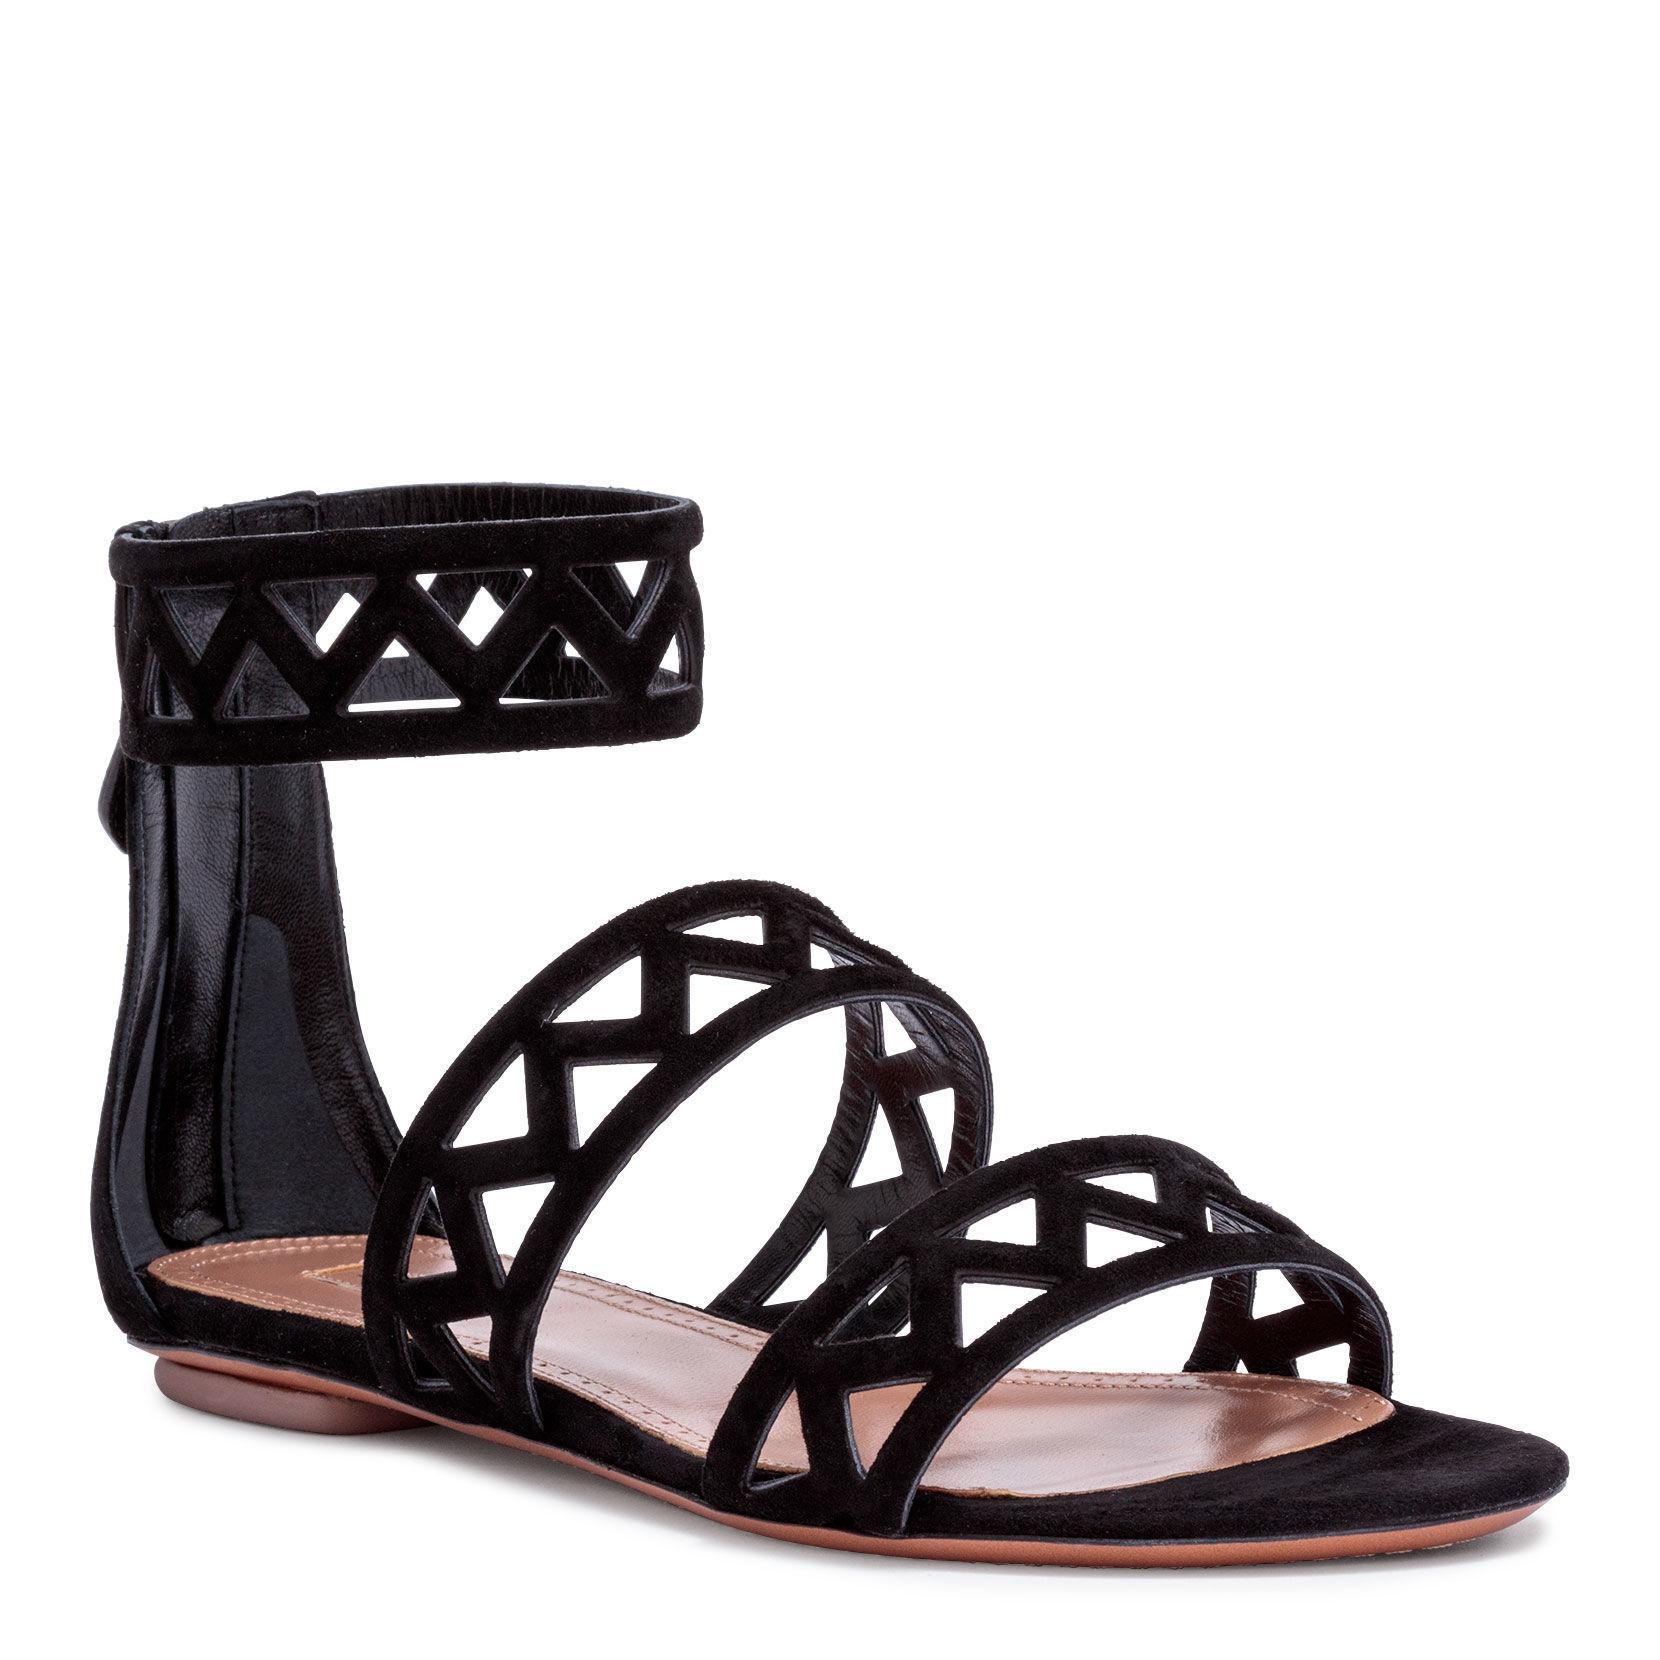 d6478133936814 Alaïa Black Suede Laser-cut Flat Sandals in Black - Save 50% - Lyst